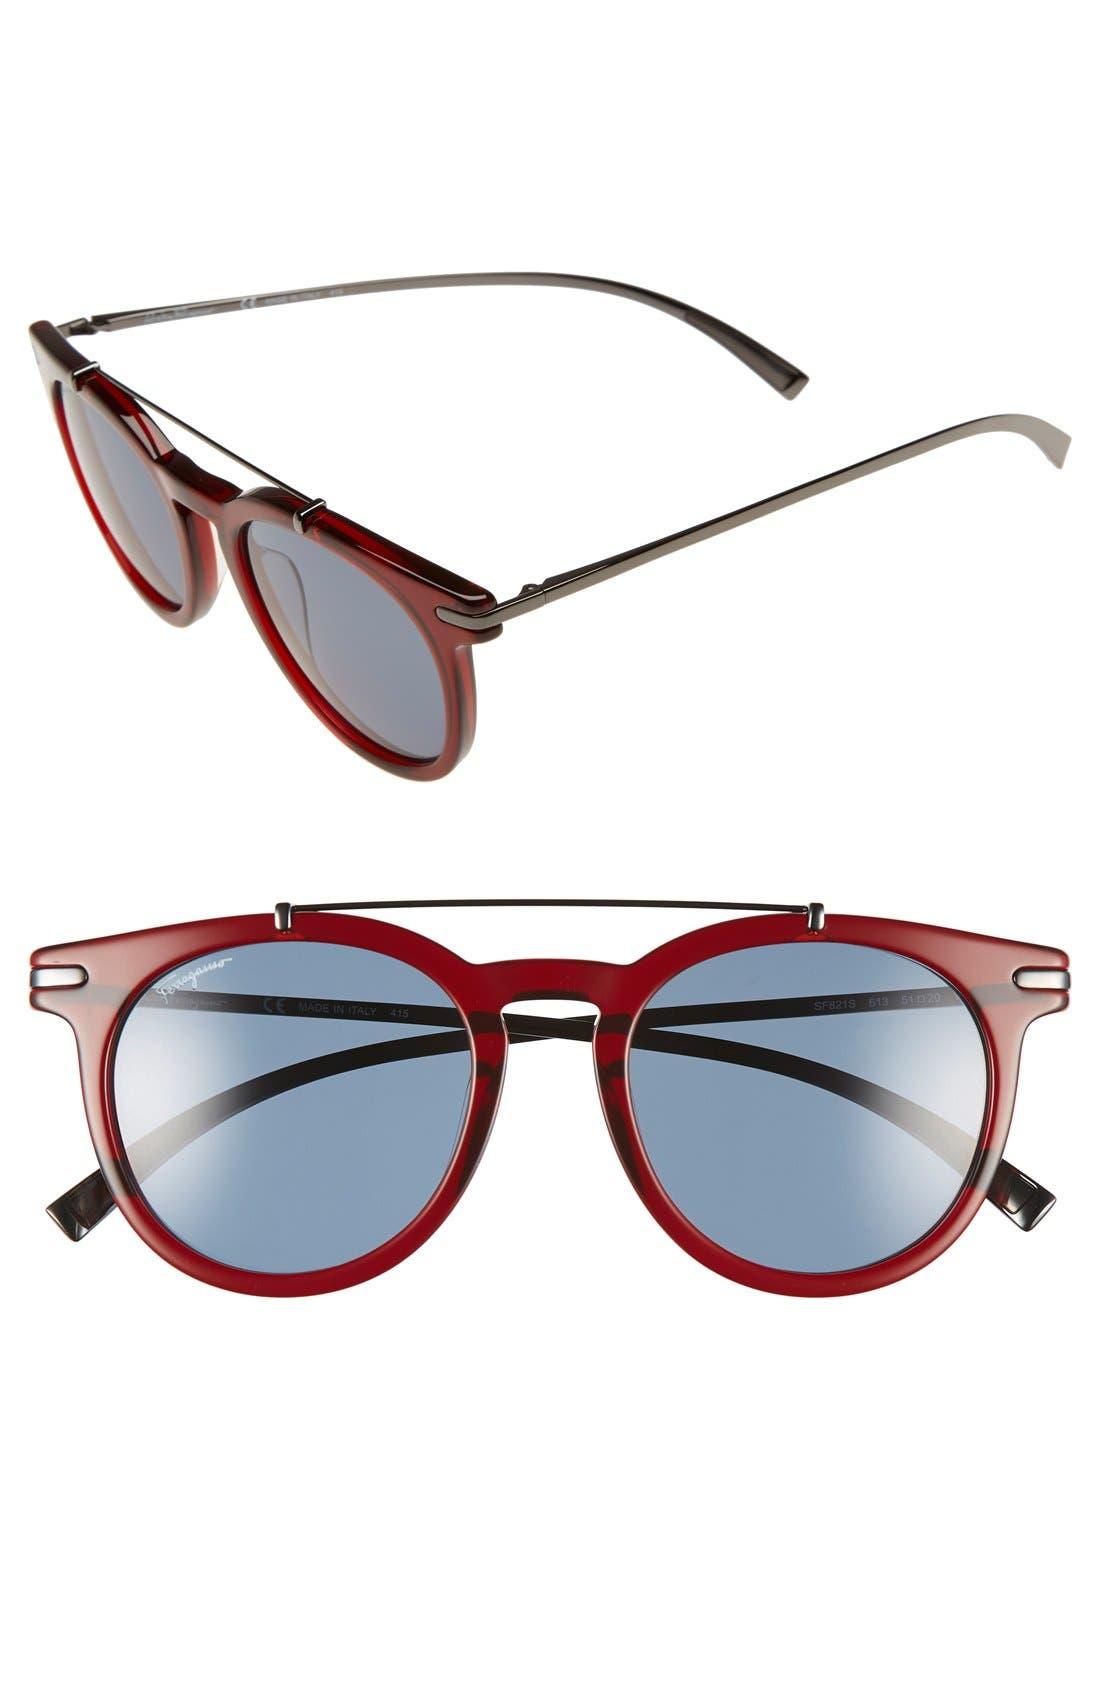 Salvatore Ferragamo 51mm Sunglasses